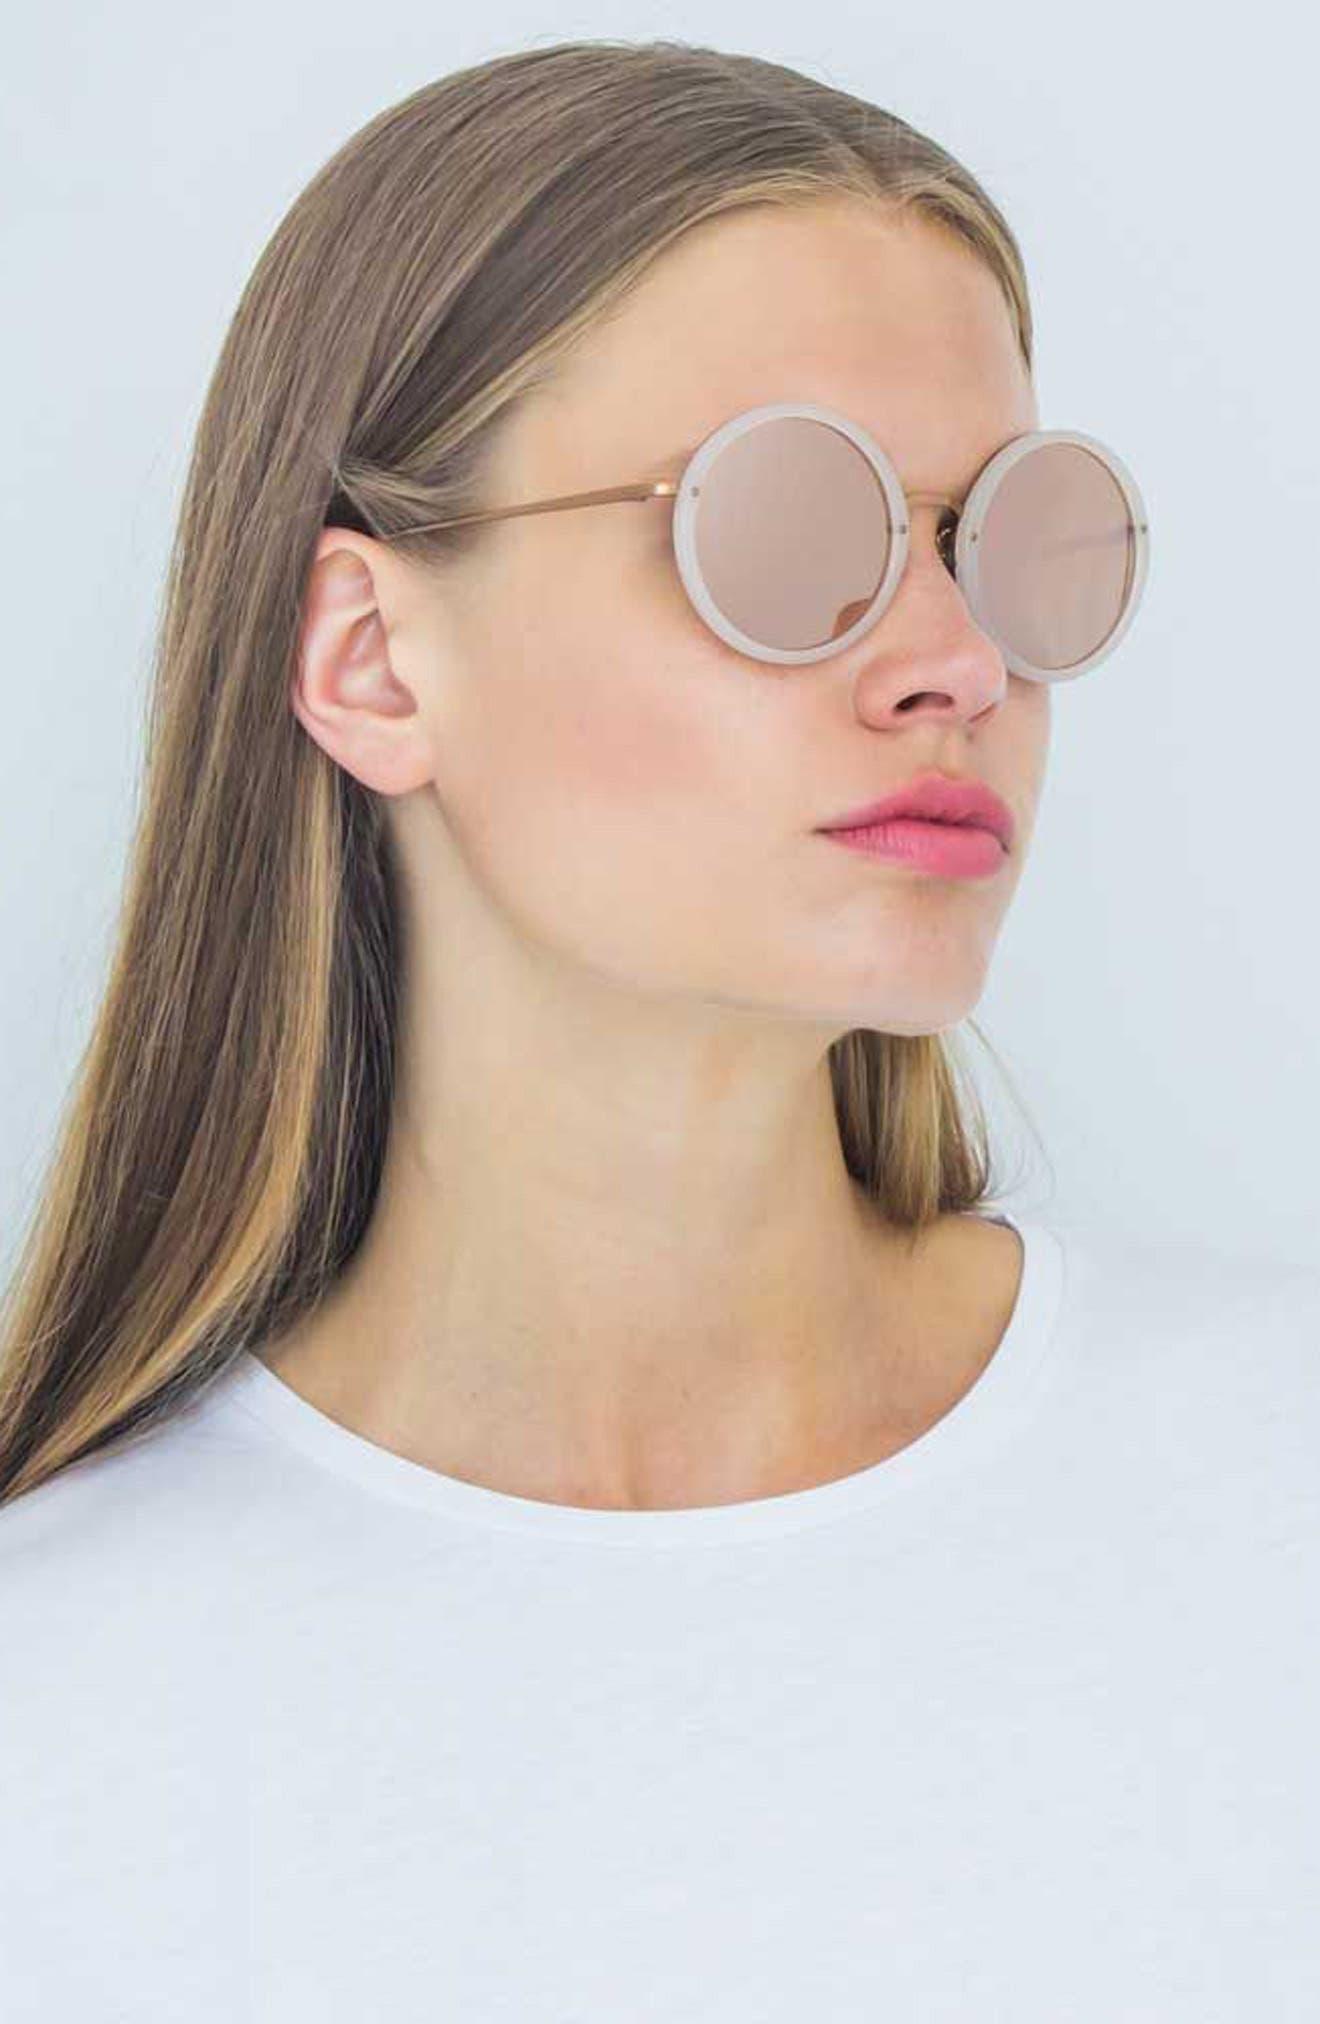 51mm Round 18 Karat Rose Gold Trim Sunglasses,                             Alternate thumbnail 3, color,                             680